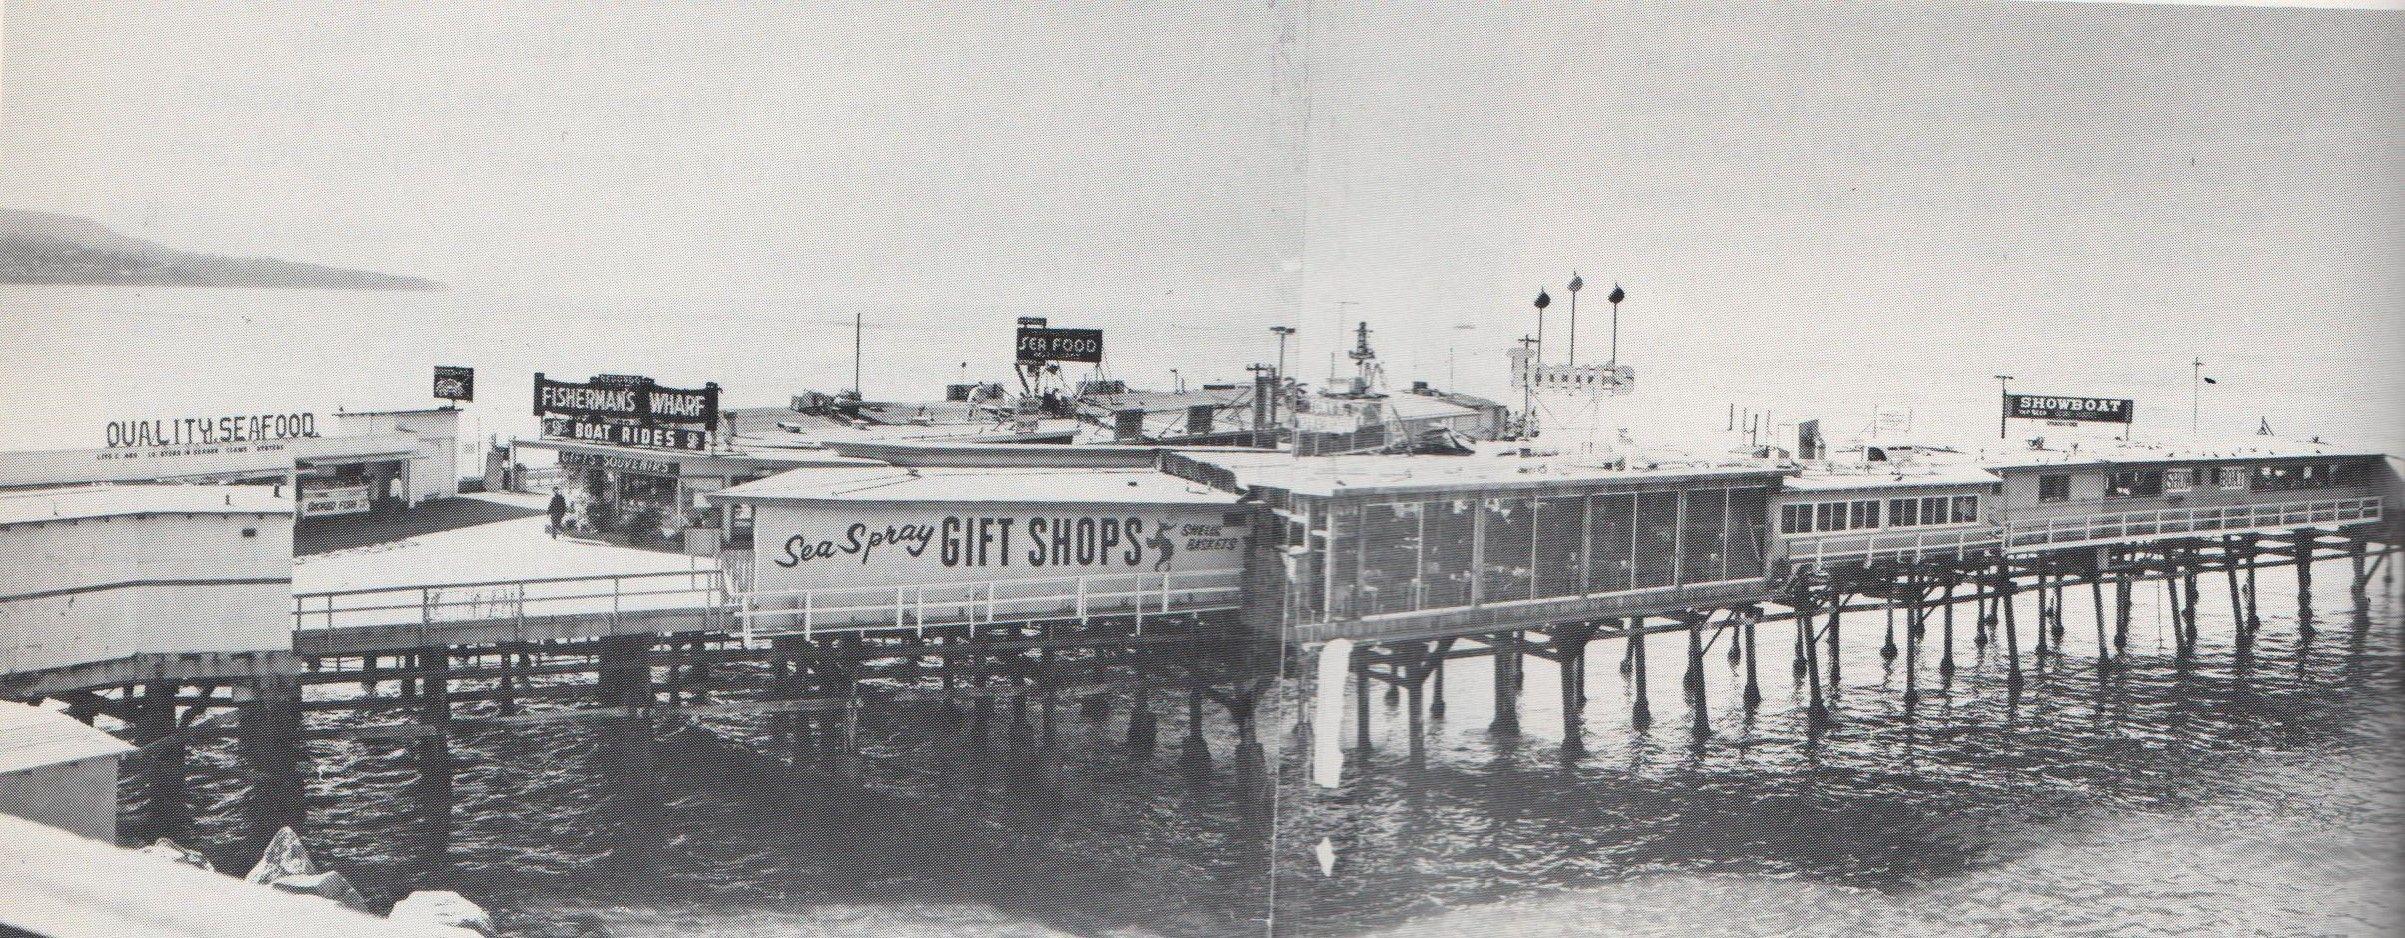 1960 Redondo Beach Pier  REDONDO BEACH CALIFORNIA OLD